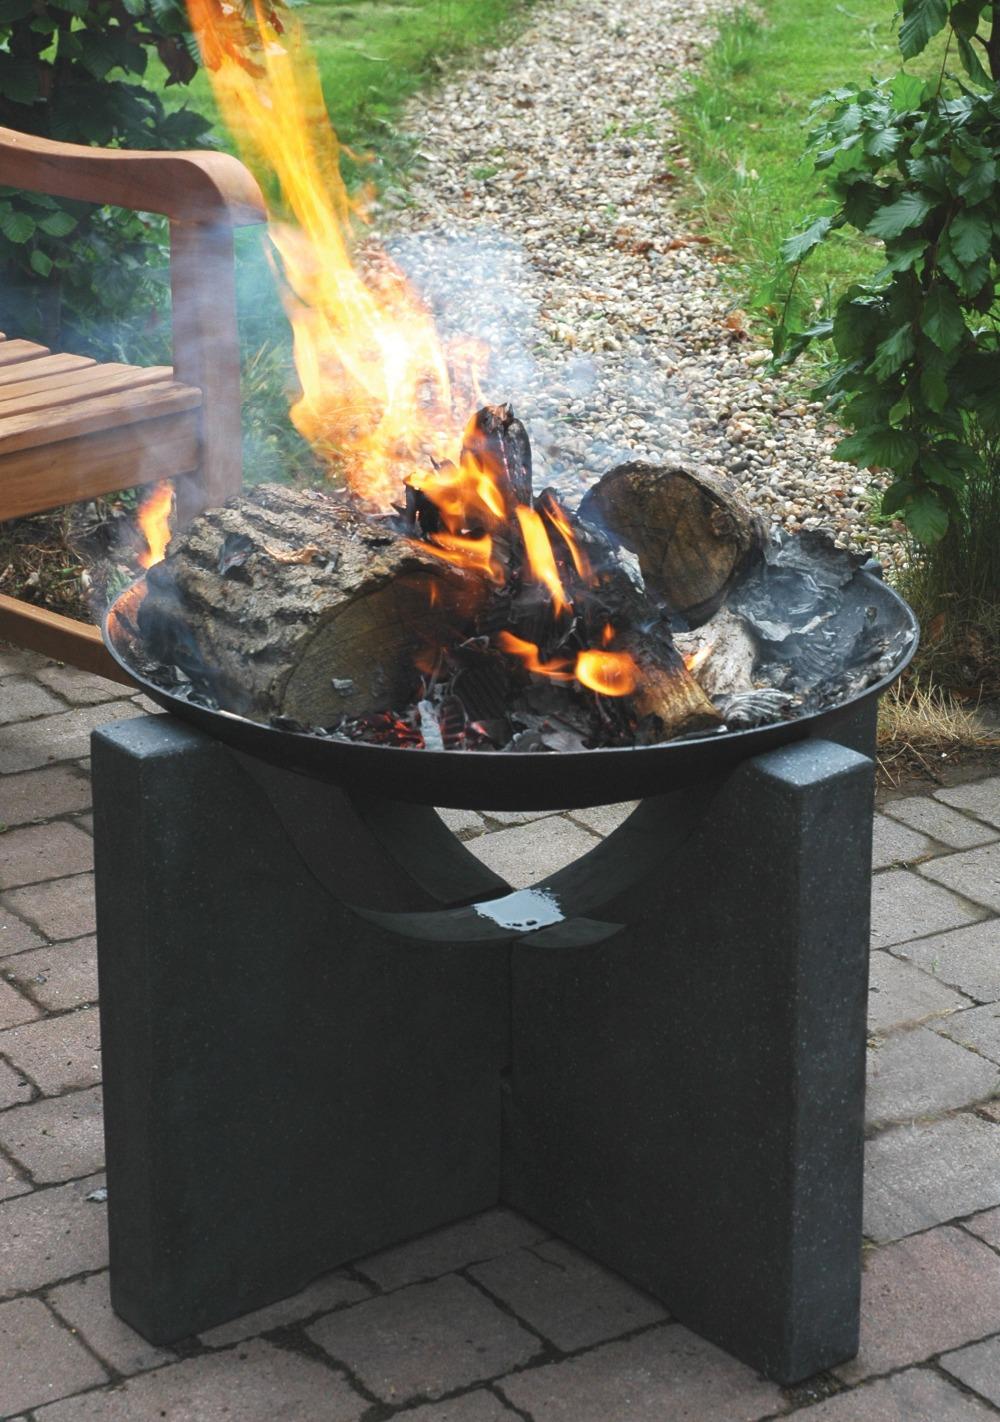 Concrete Base Castiron Fire Pit Outdoor Fireplace Buy Fire Pit